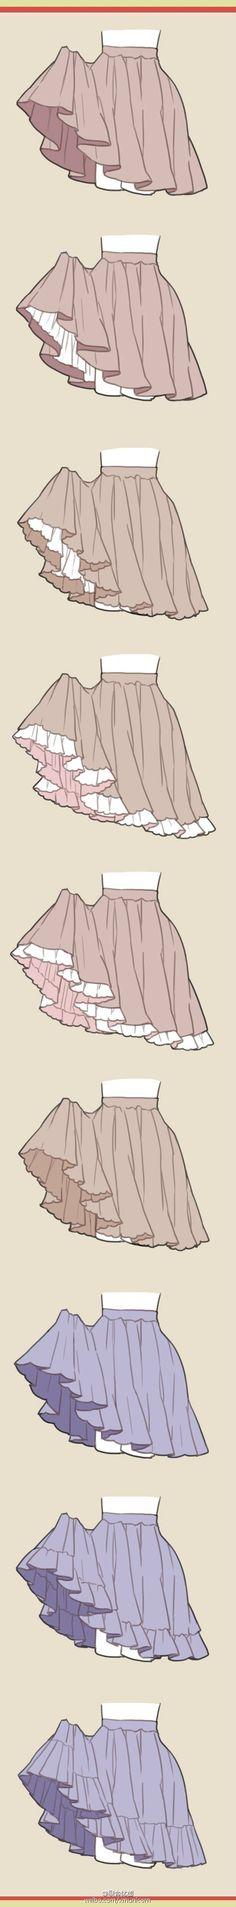 Japanese-style skirt variations